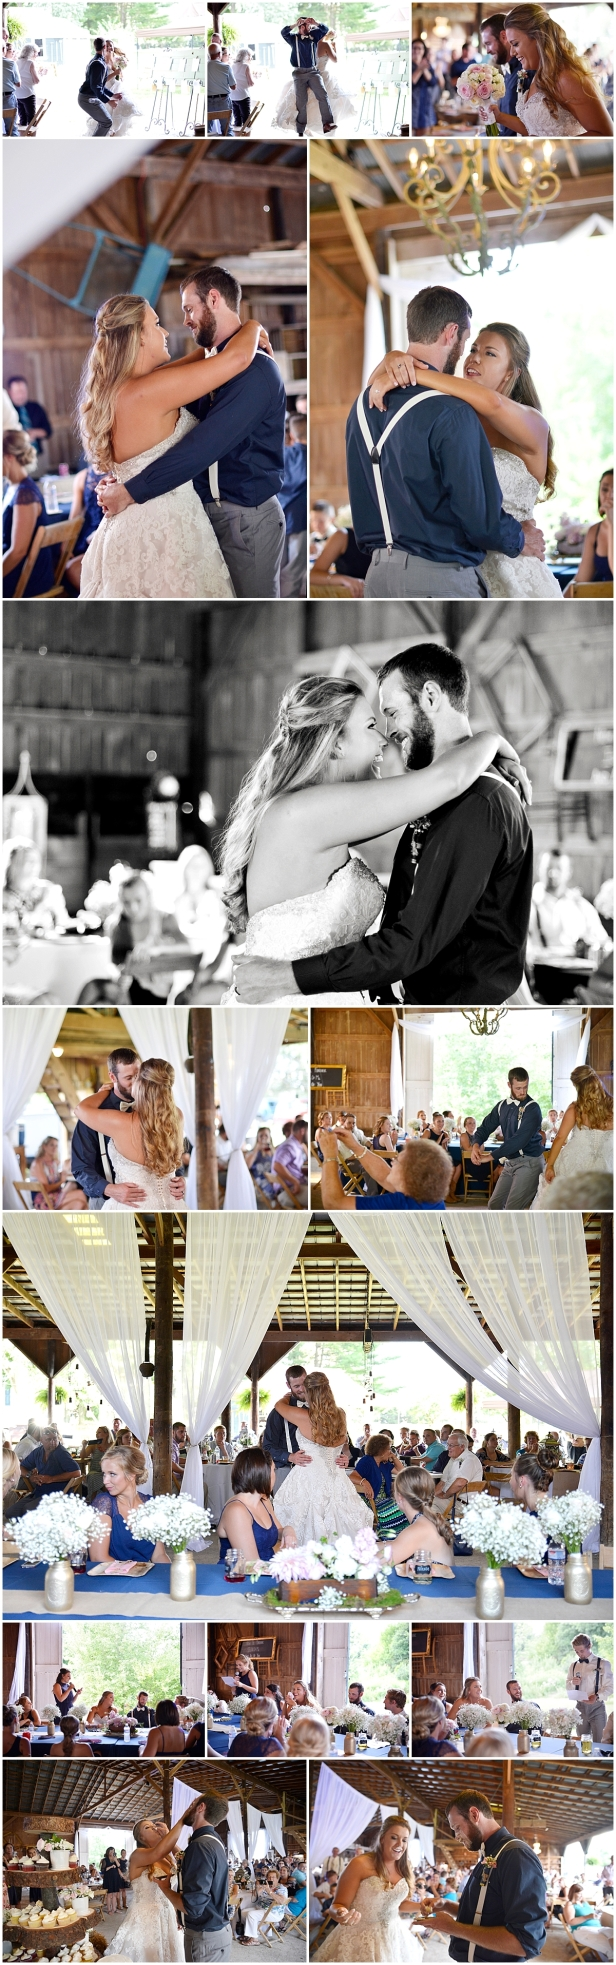 Jordan&Dustin's Barn Wedding, Delaware/OH {Wedding ...